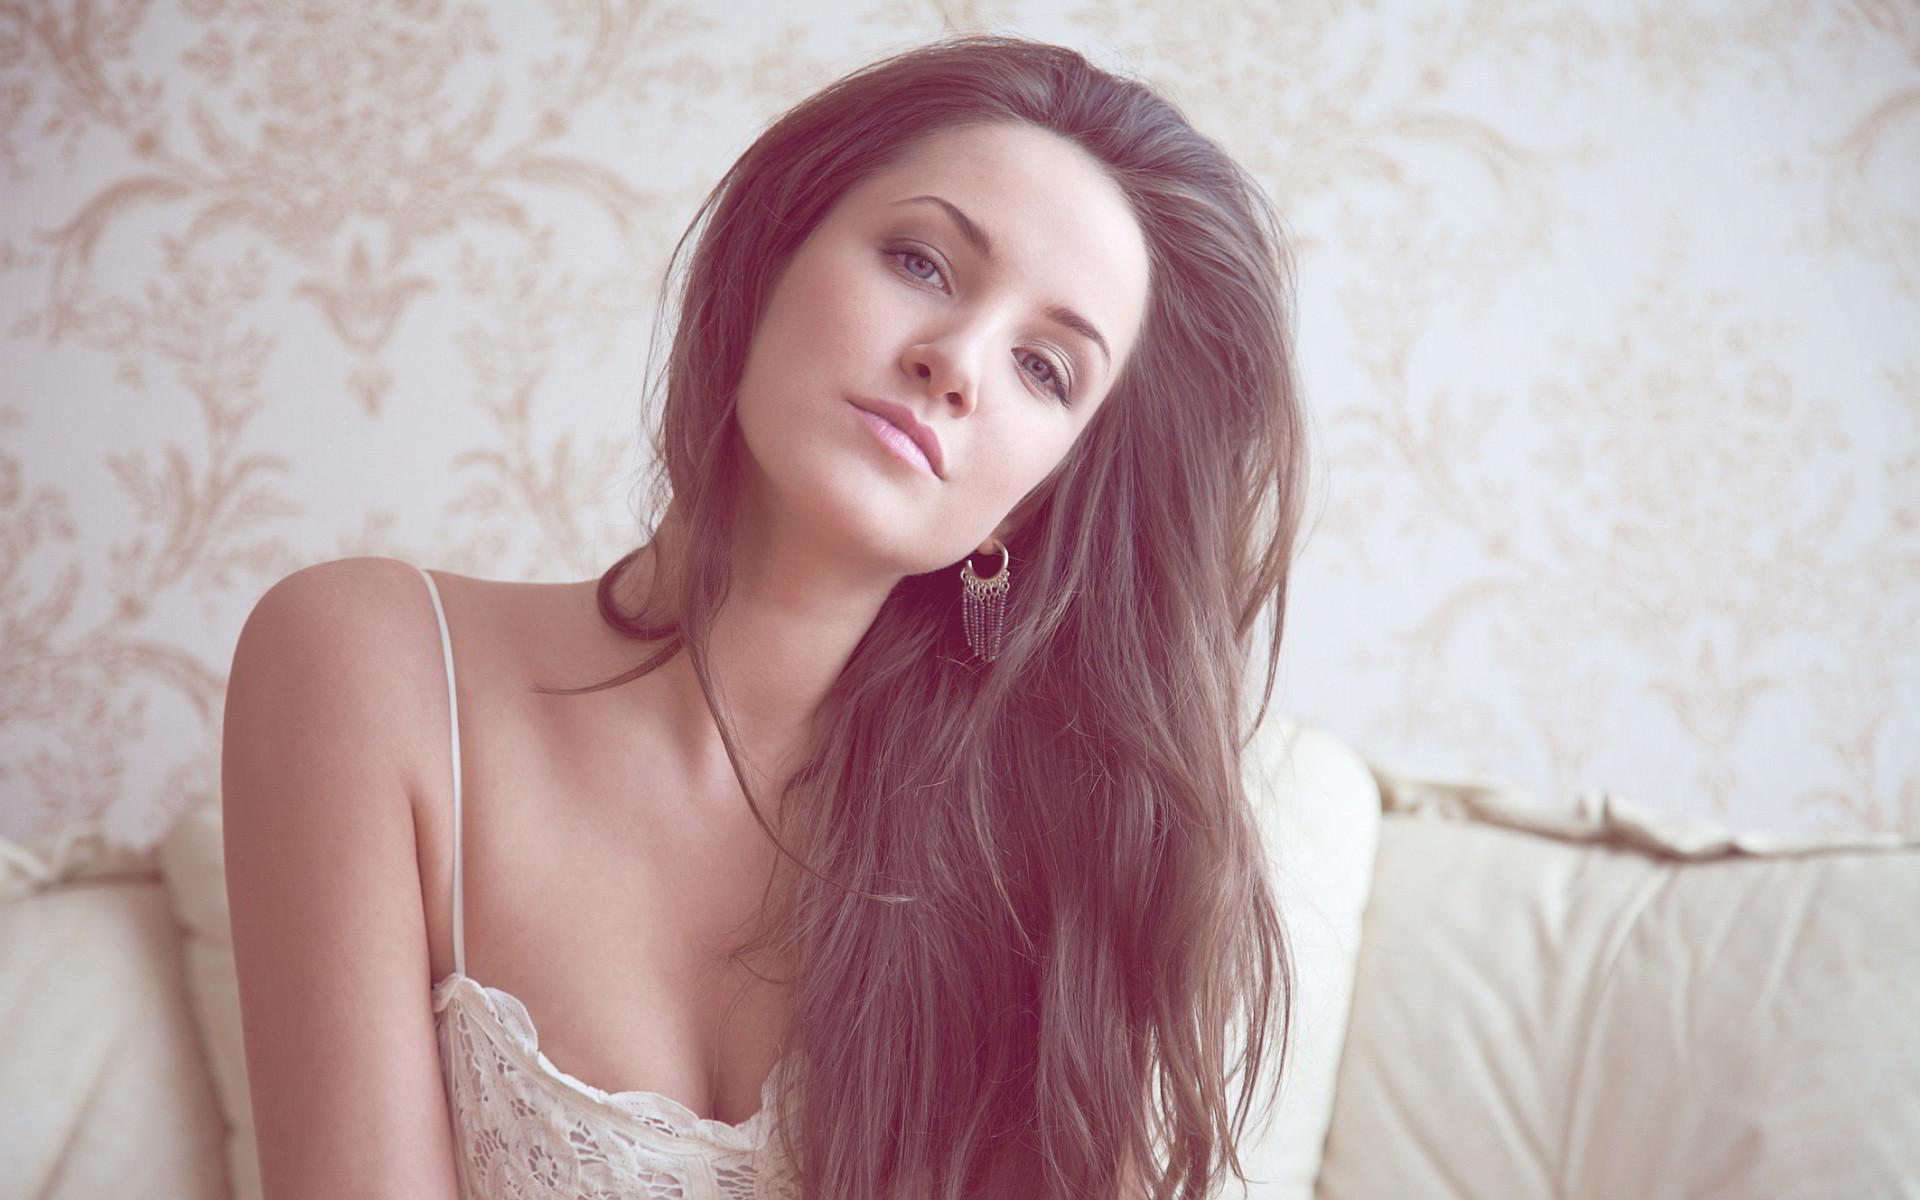 Most Beautiful Women Wallpaper